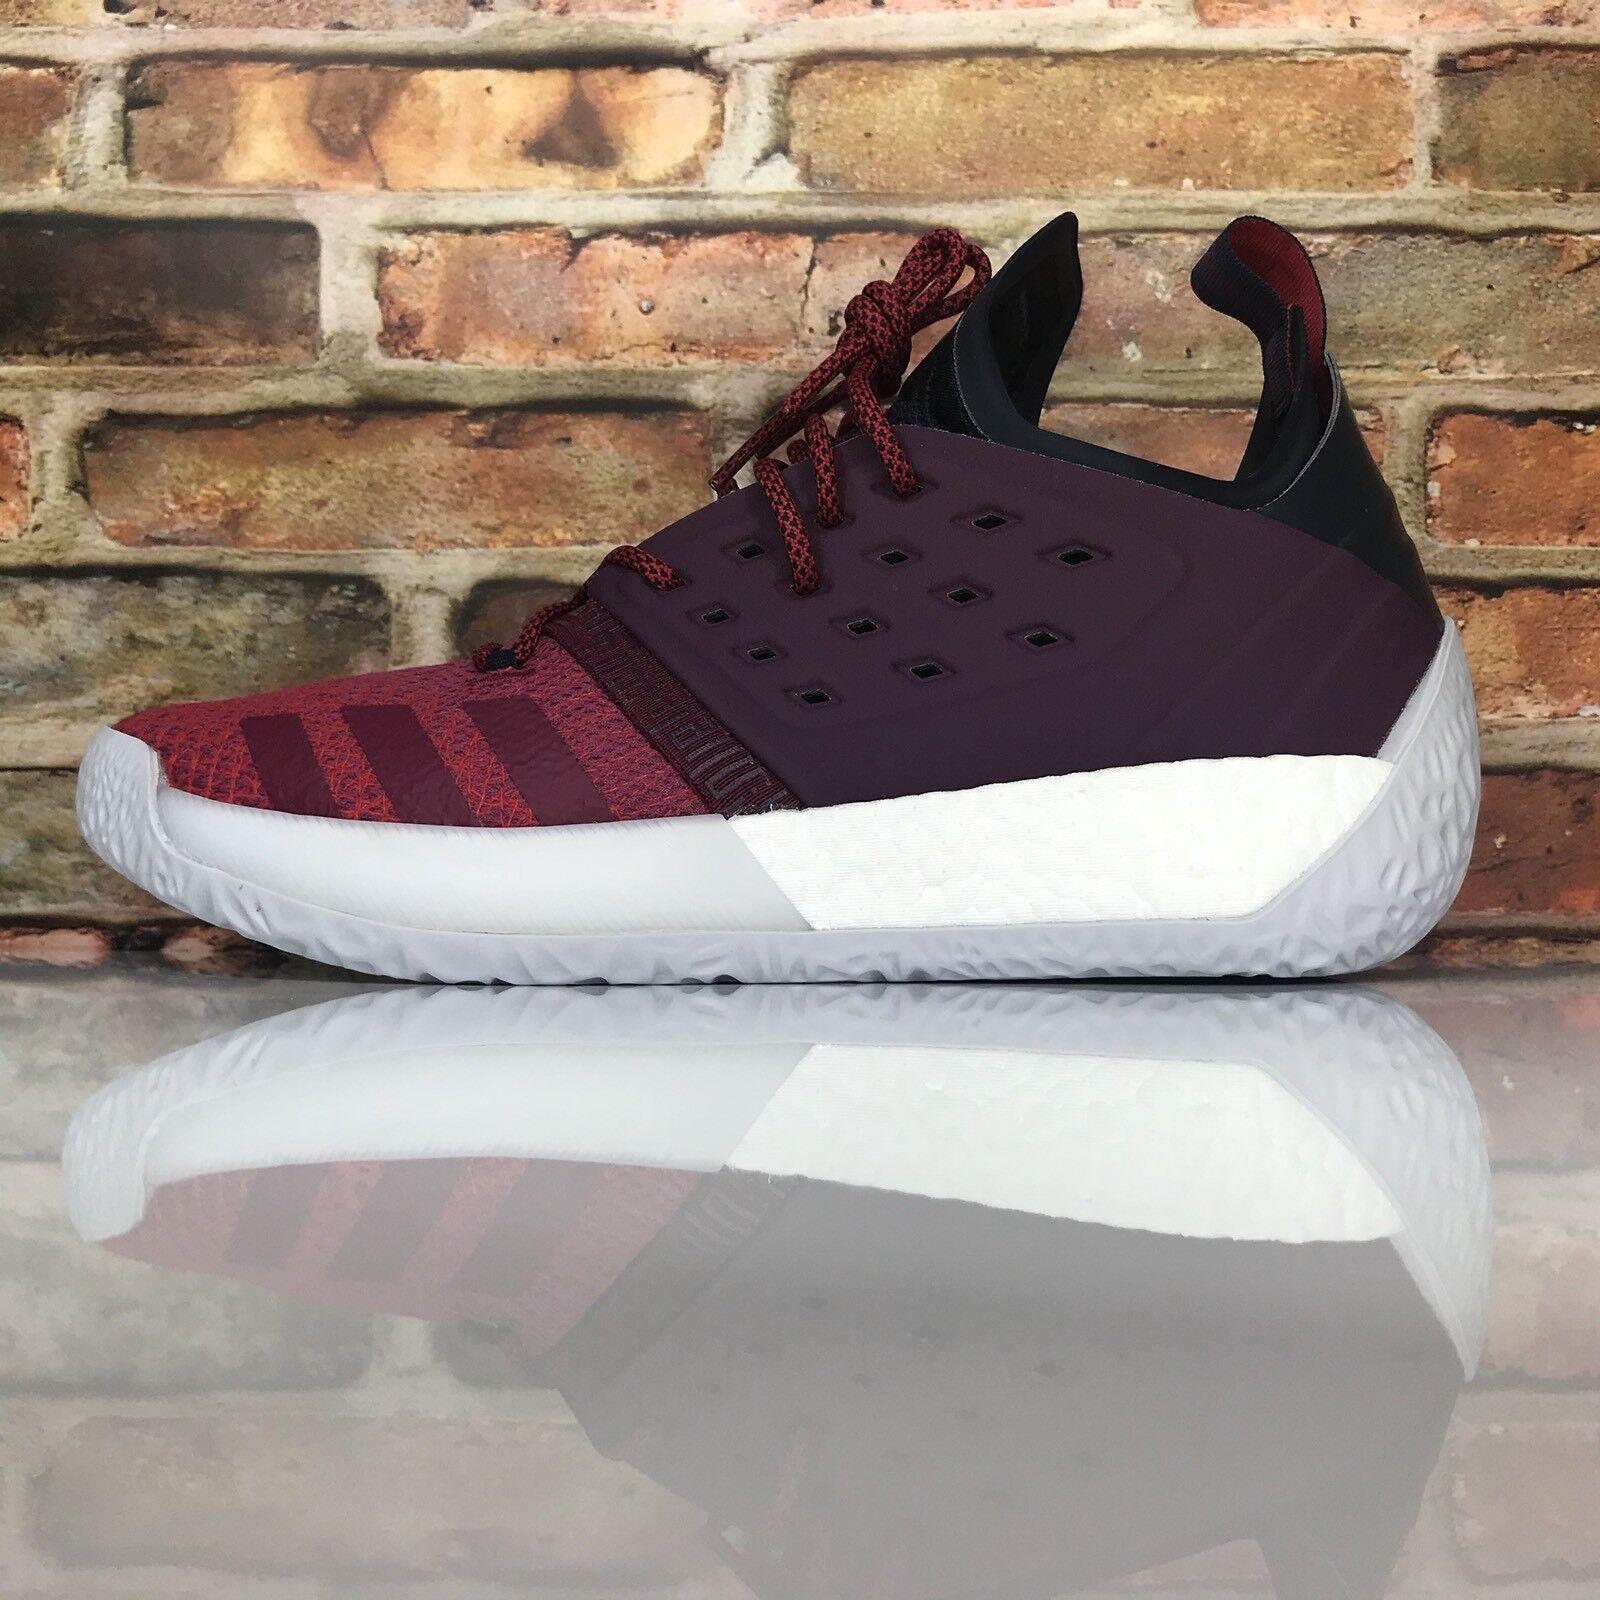 Adidas James Harden MVP Vol. 2 Men 14 Basketball Shoes Ignite Maroon AH2124